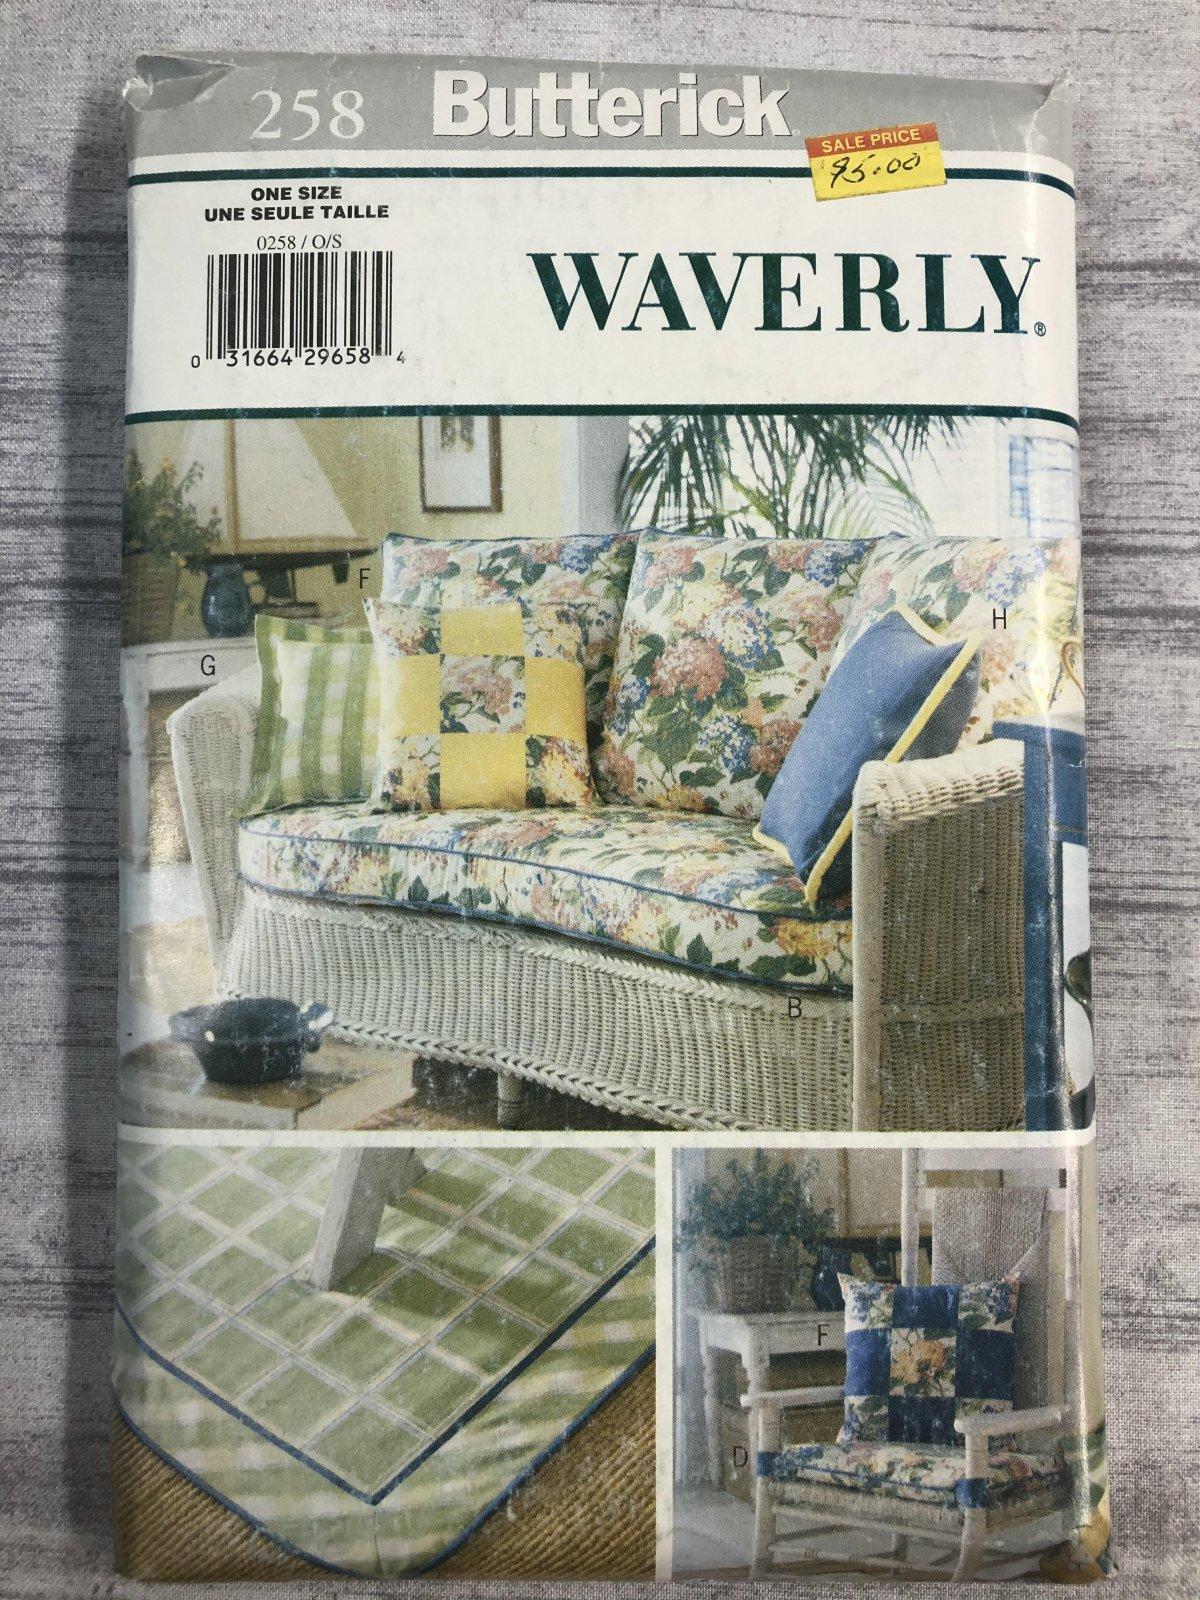 Butterick Waverly Sunroom 0258